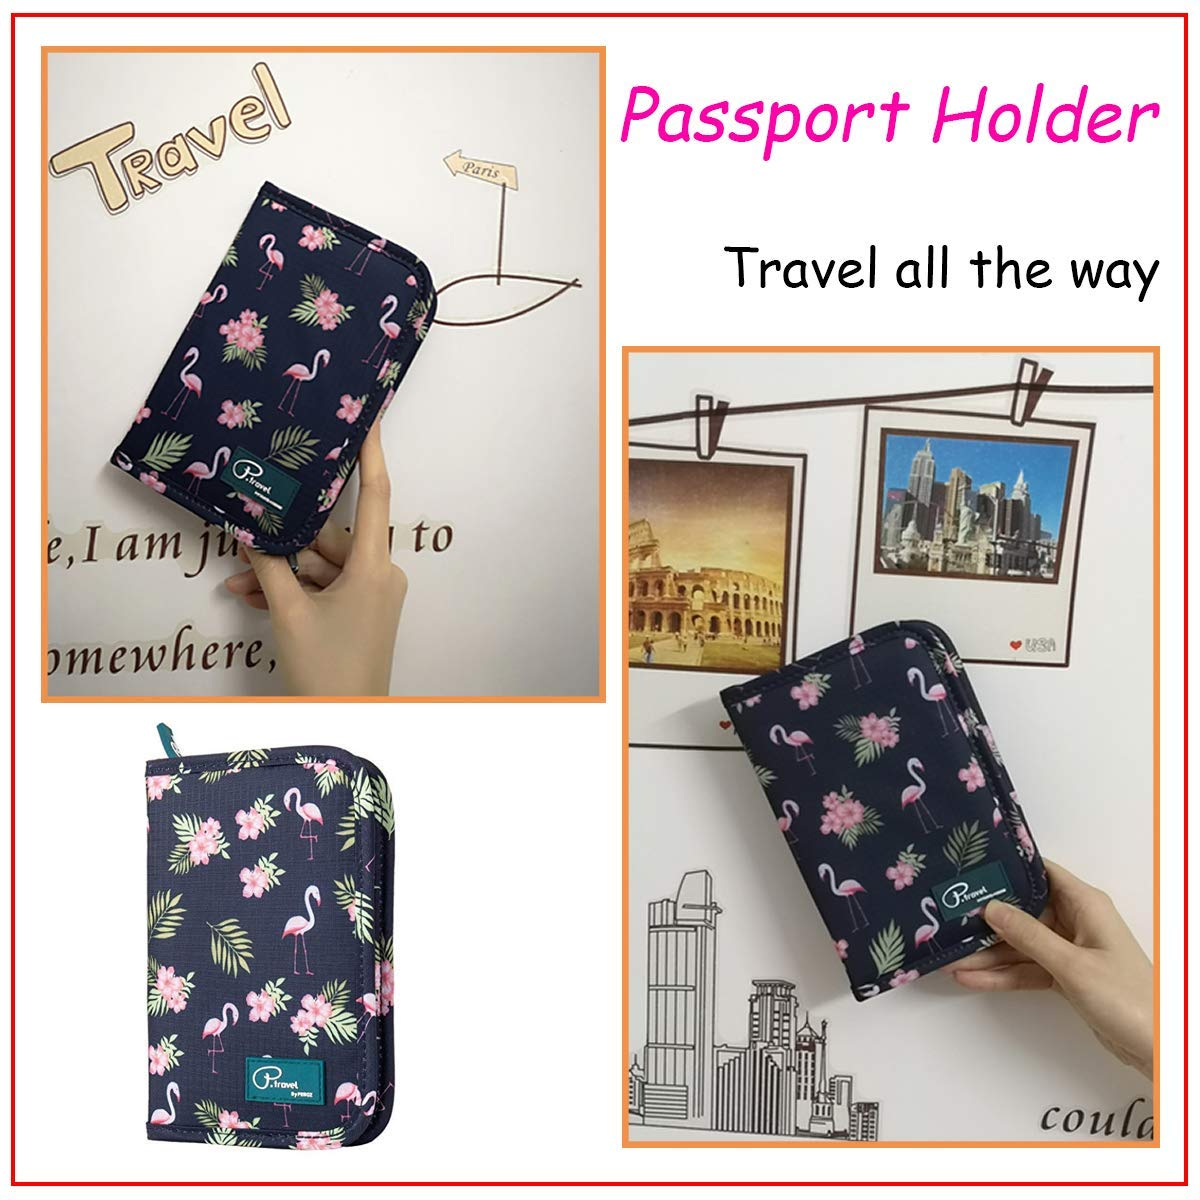 Flamingo SQSM Passport Wallet Holder for Men/&Women,RFID Blocking Travel Waterproof Credit Card/&Money Bag Multifunctional,Travel Wallet Passport Organiser Case with Zipper